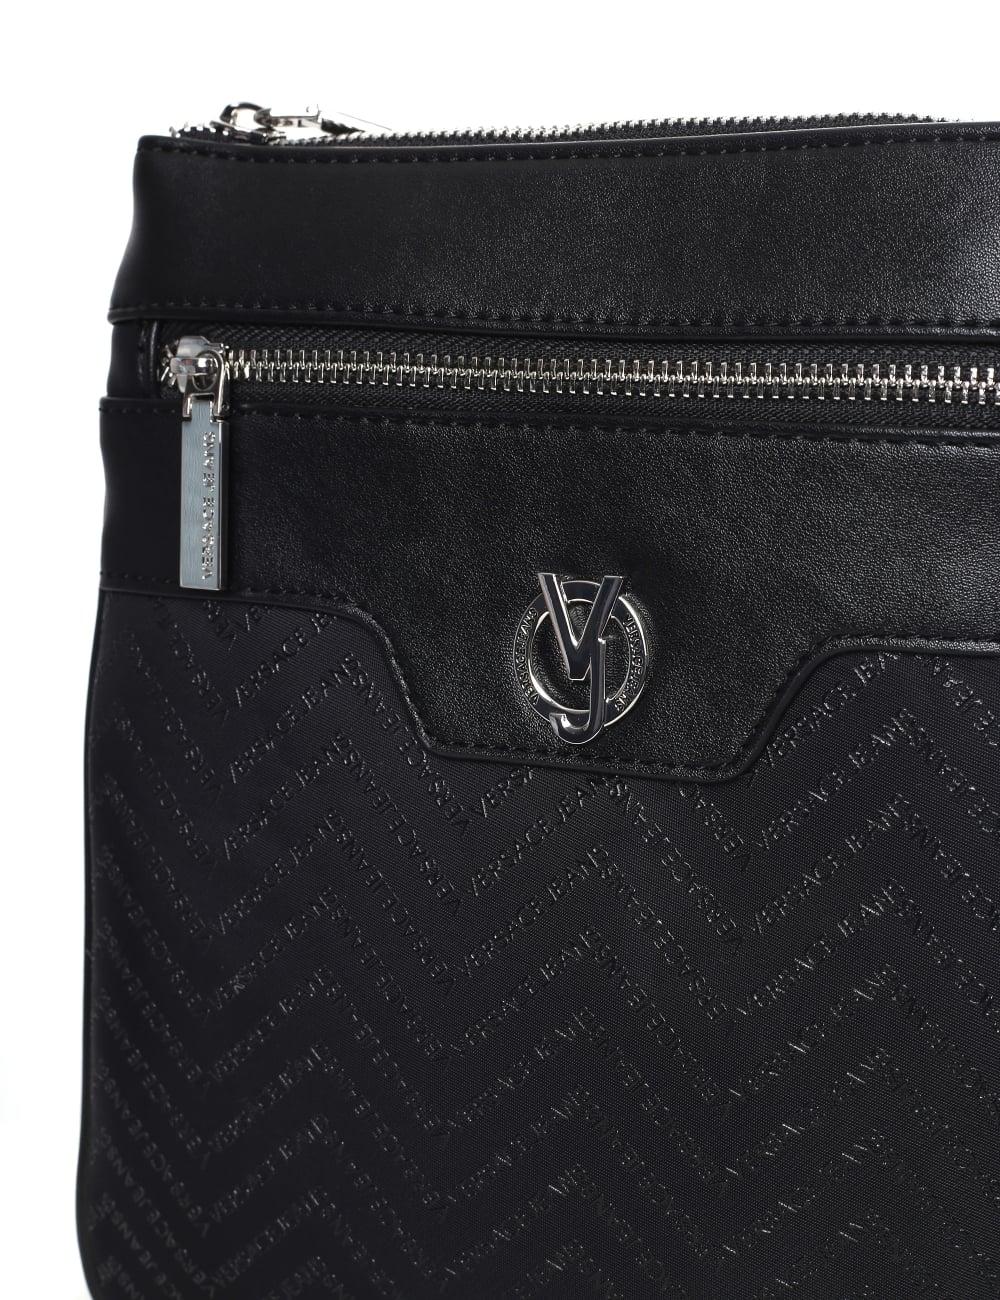 9e4454bac9 Versace Jeans Repeat Logo Men's Linea Messenger Bag